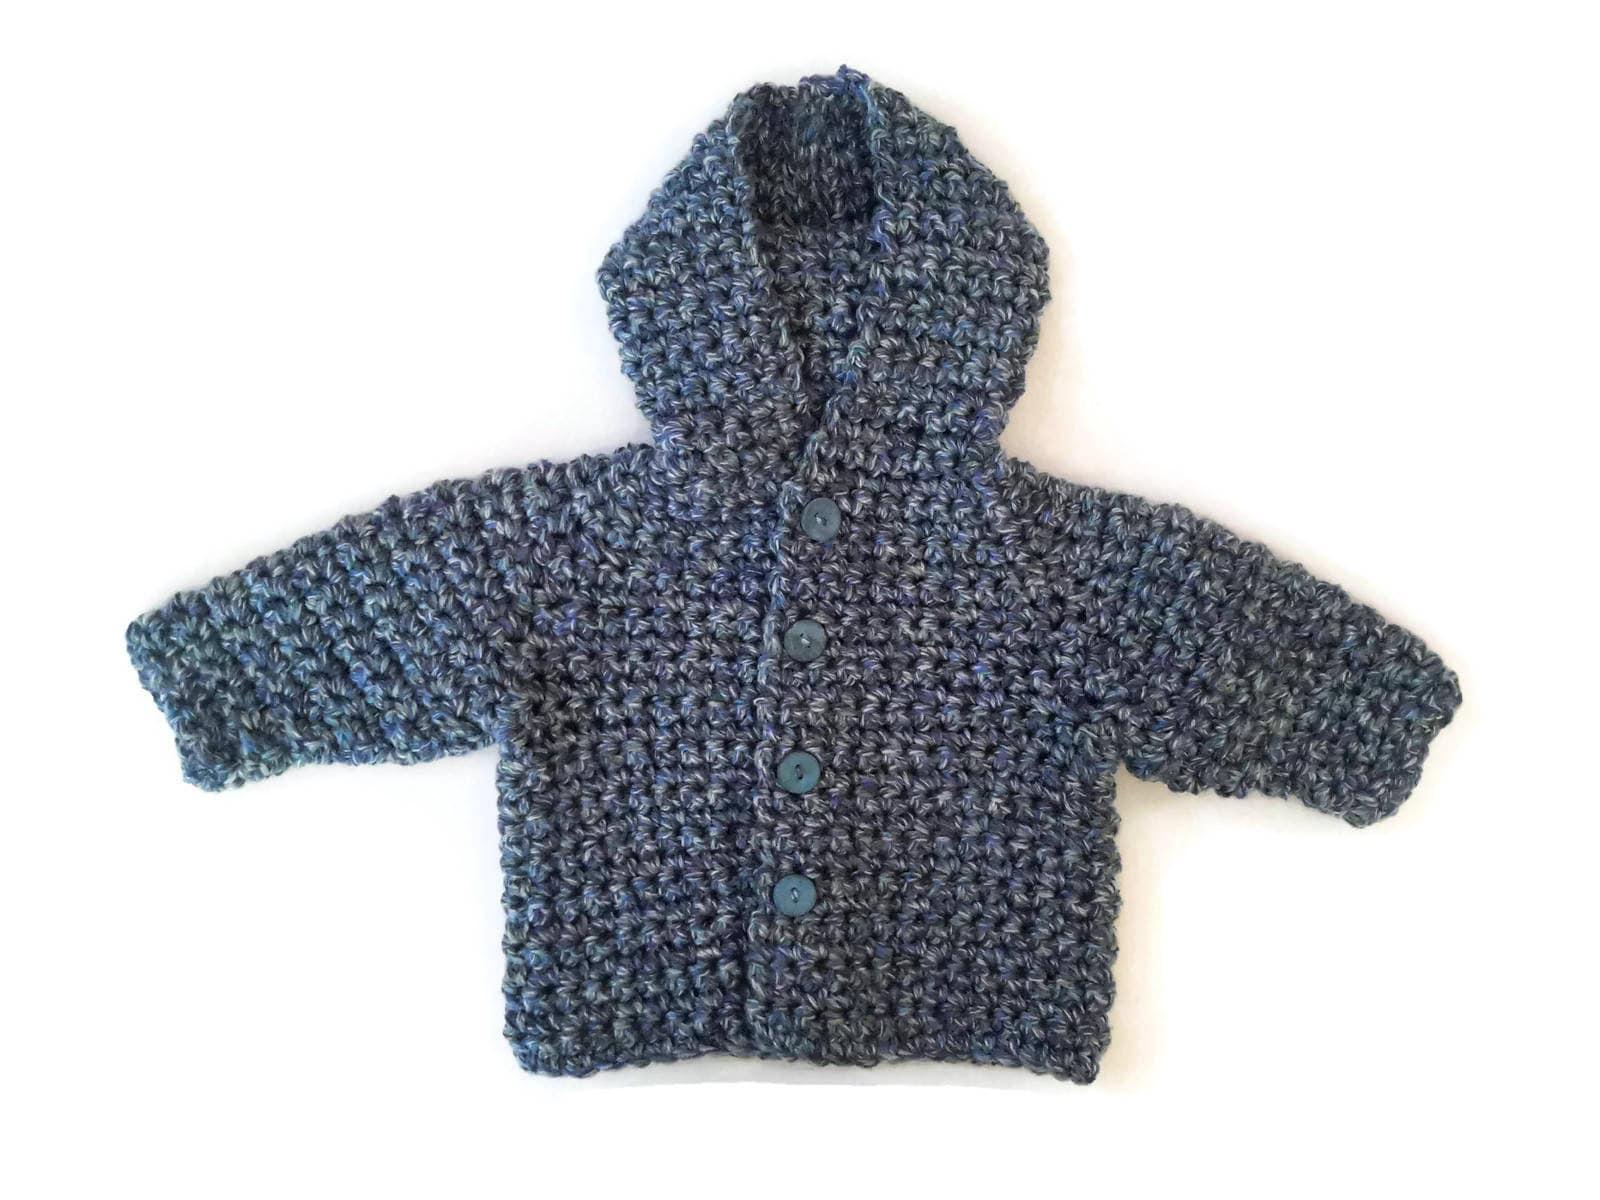 Baby boy/'s cardigan,baby boy/'s jacket,blue cardigan,blue jacket,shawl collar,brown white blue cardigan,brown white blue jacket,babywear